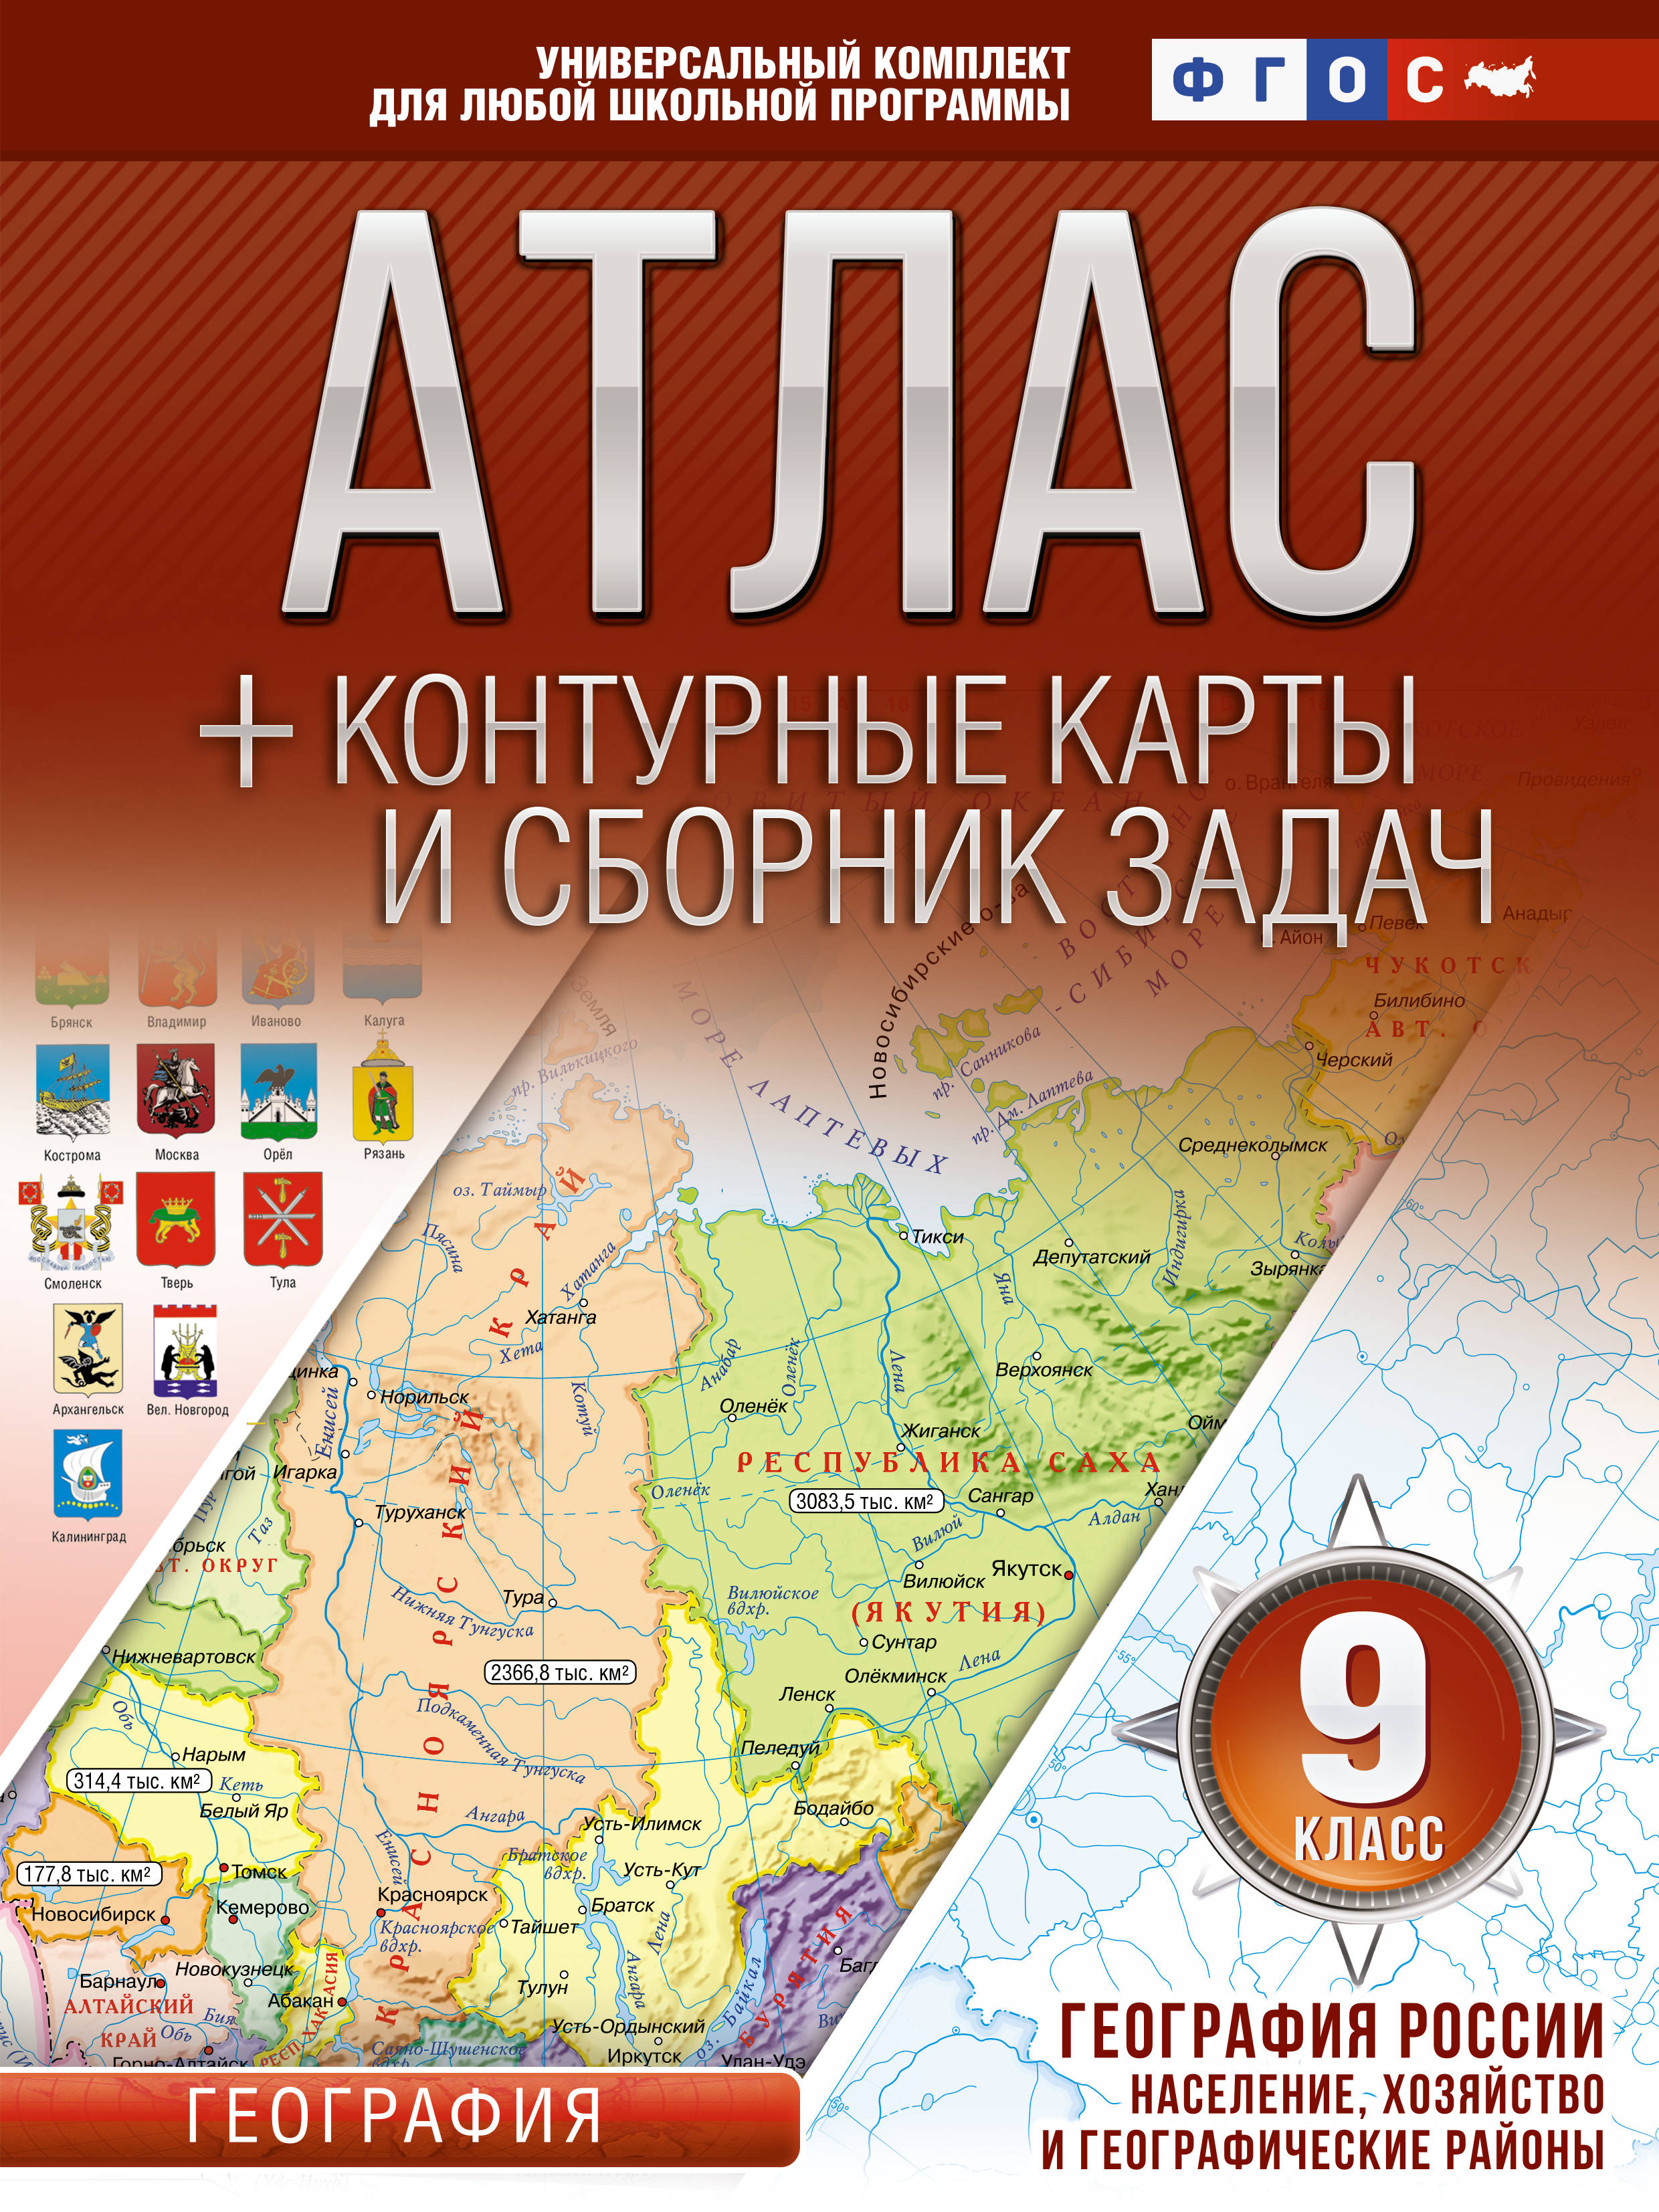 Atlas + konturnye karty 9 klass. Geografija Rossii. Naselenie, khozjajstvo i geograficheskie rajony. FGOS (s Krymom)